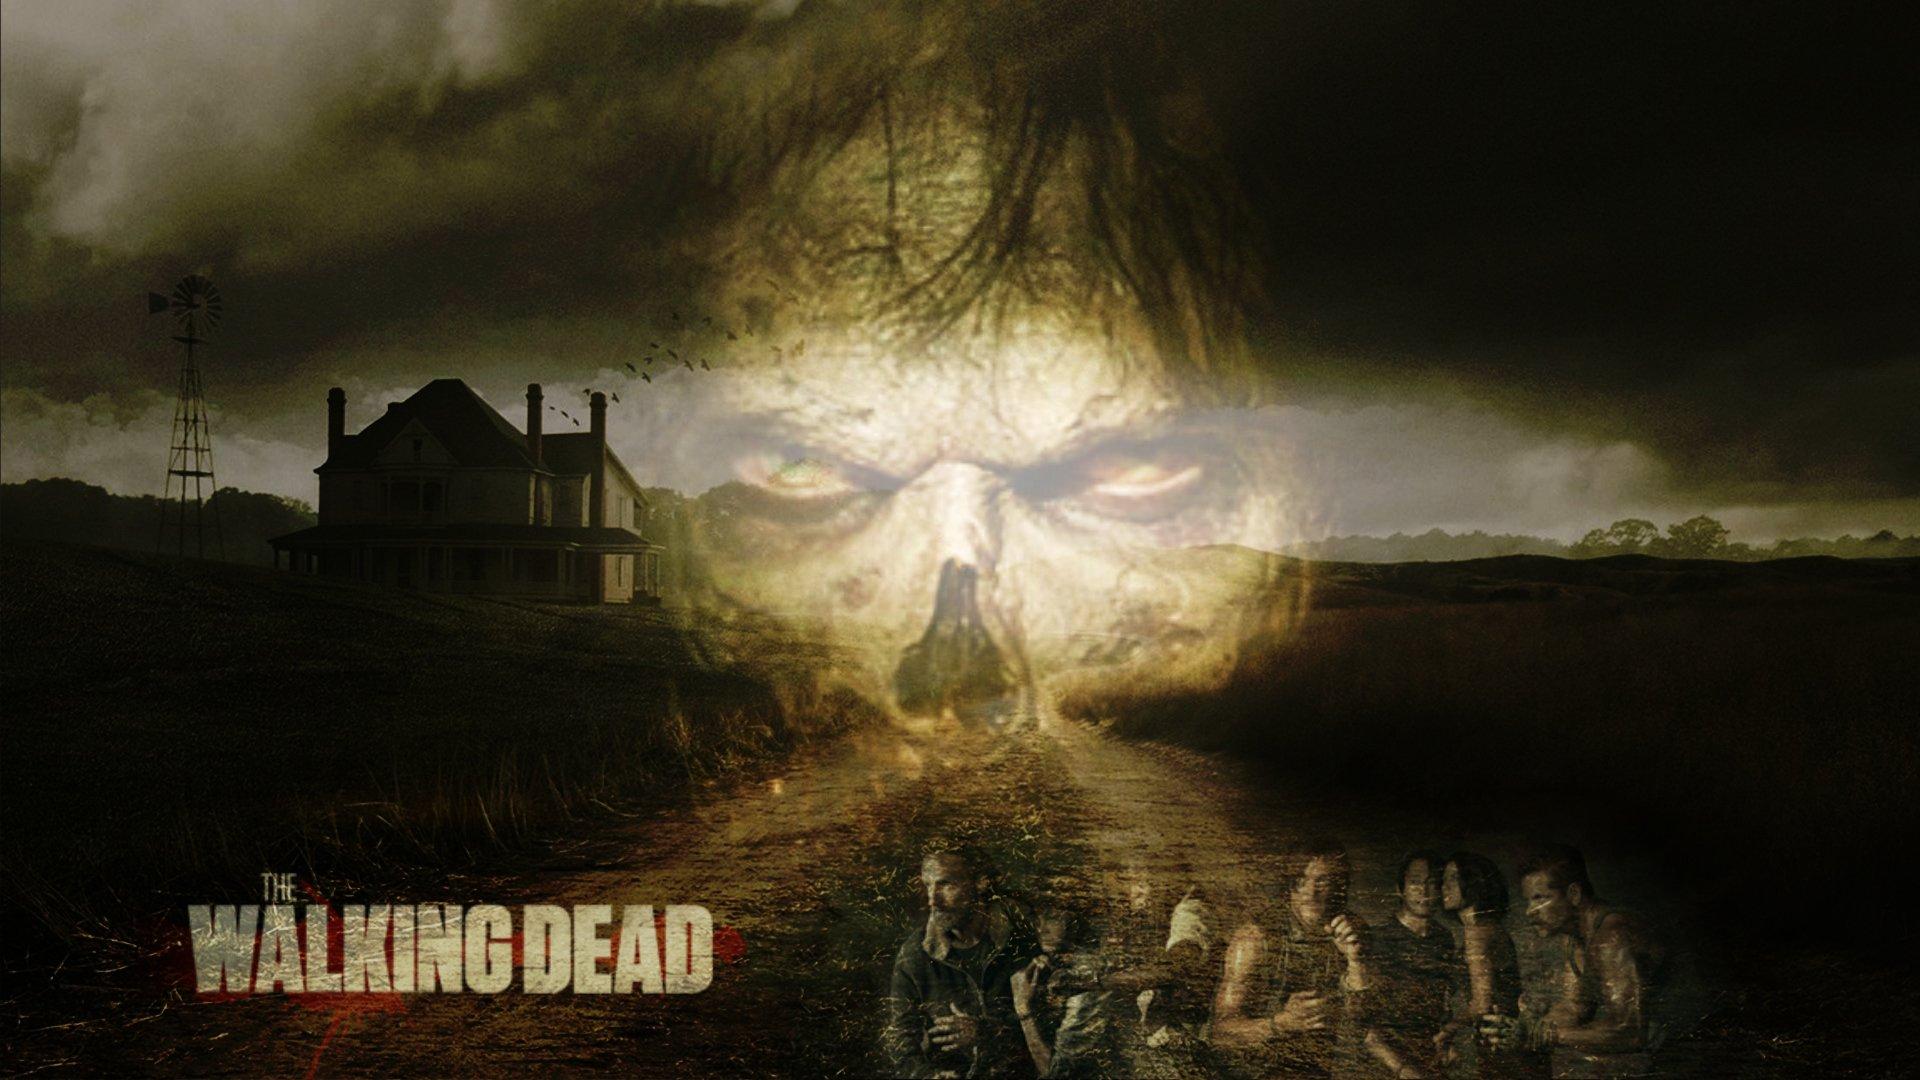 The Walking Dead Temporada 6 Cartel Fondos Fondos De: The Walking Dead Fondo De Pantalla HD